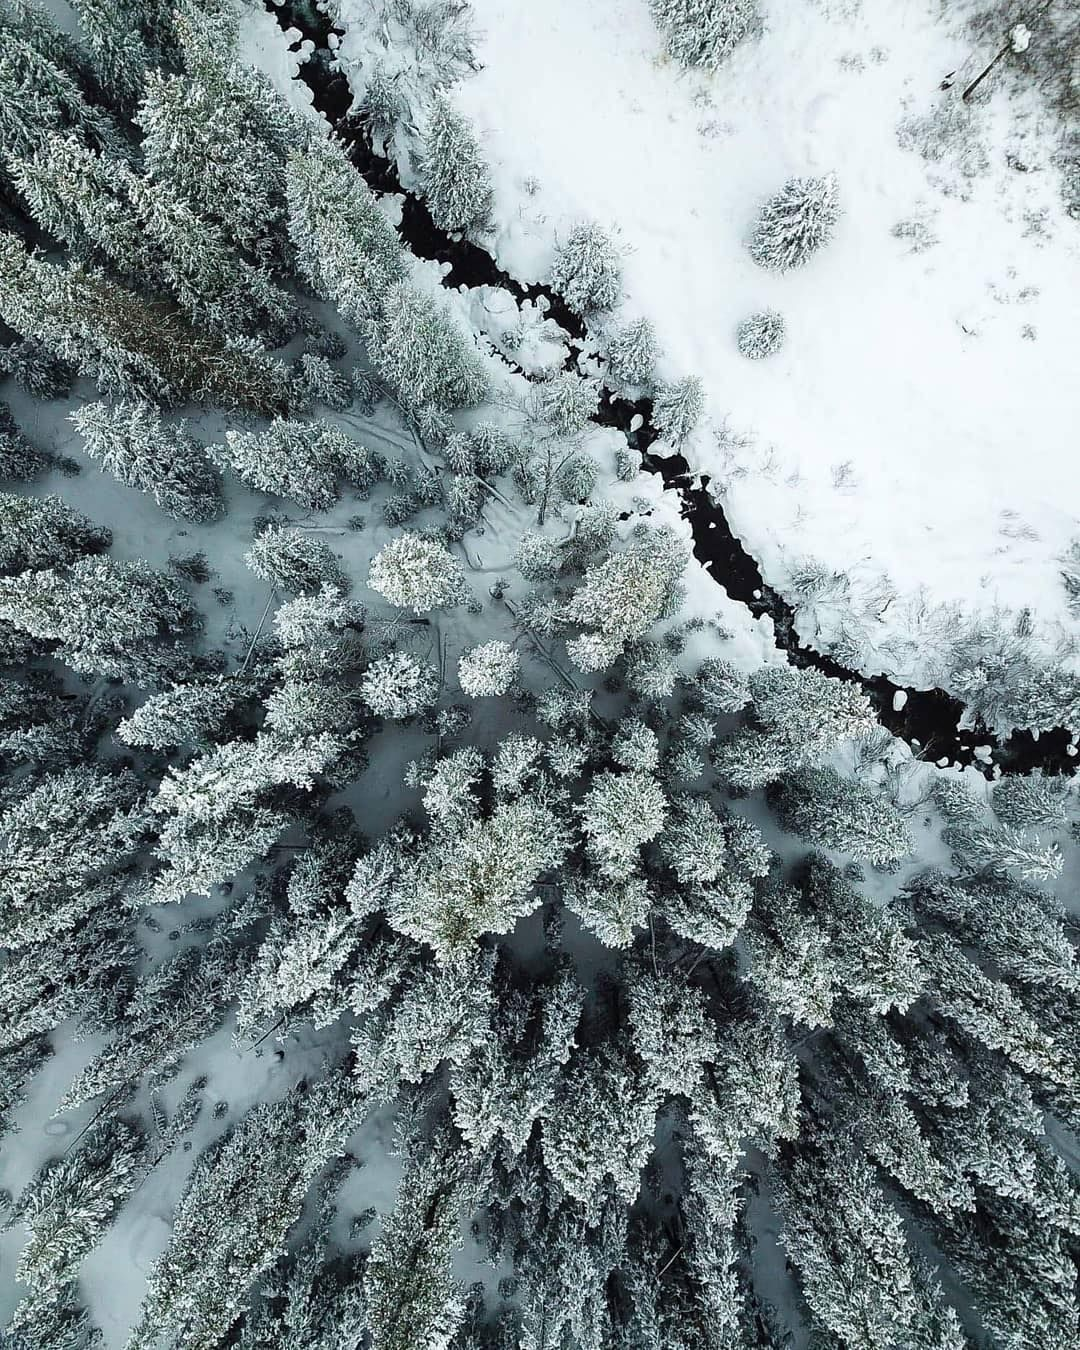 #Winteriscoming -